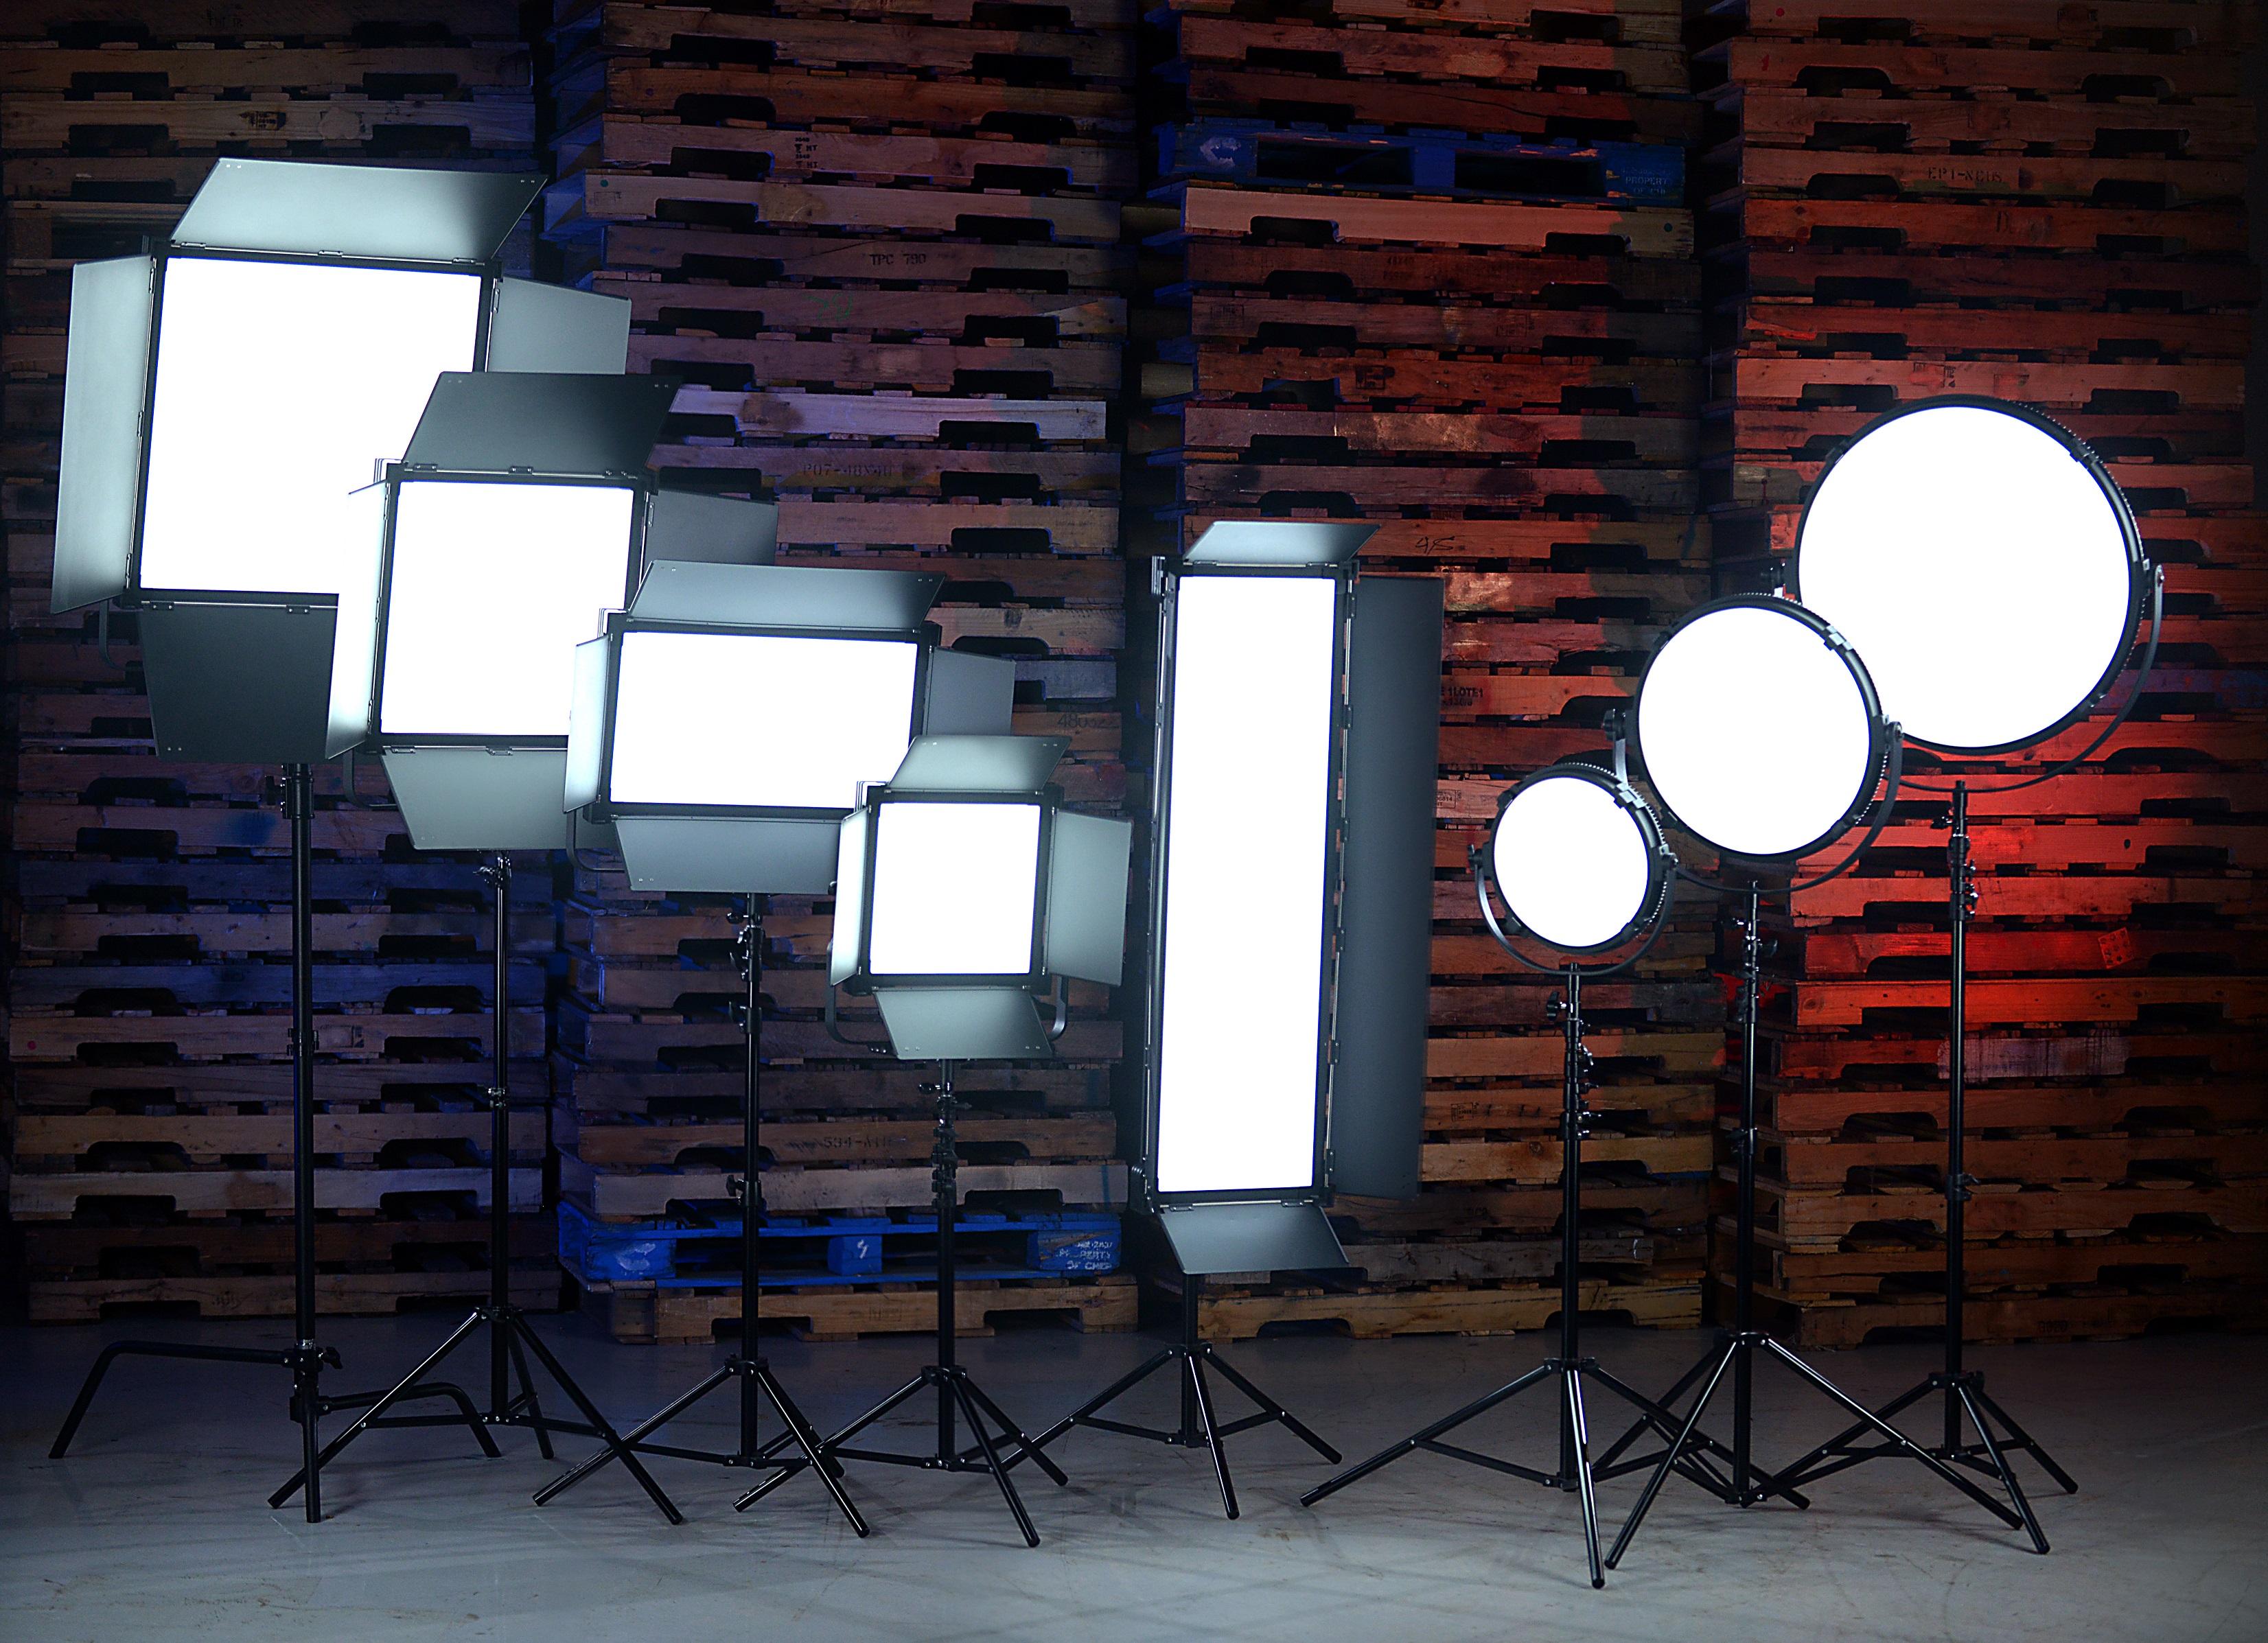 Fotodiox Pro Metal Honeycomb 12-inch Grid 50 Degree for The Factor Jupiter12 VR-1200ASVL Studio Light